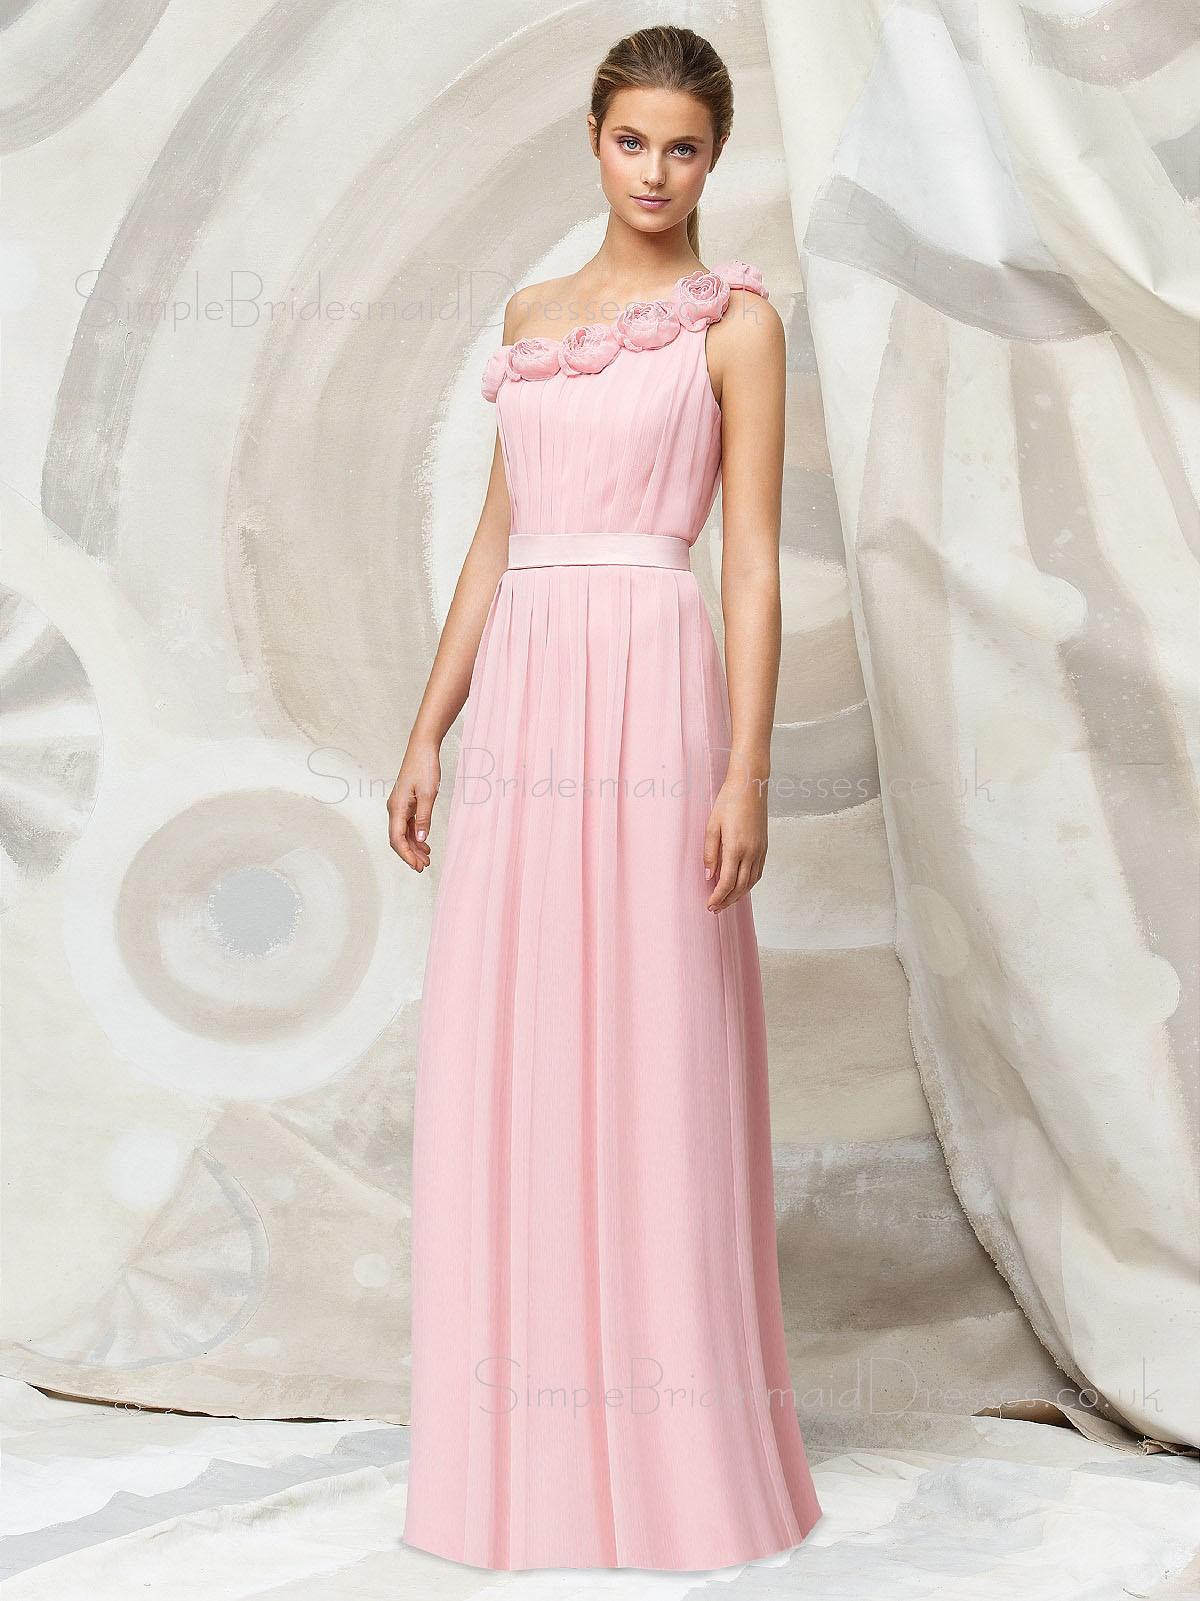 Pink Floor-length Chiffon Natural A-line Bridesmaid Dress ...